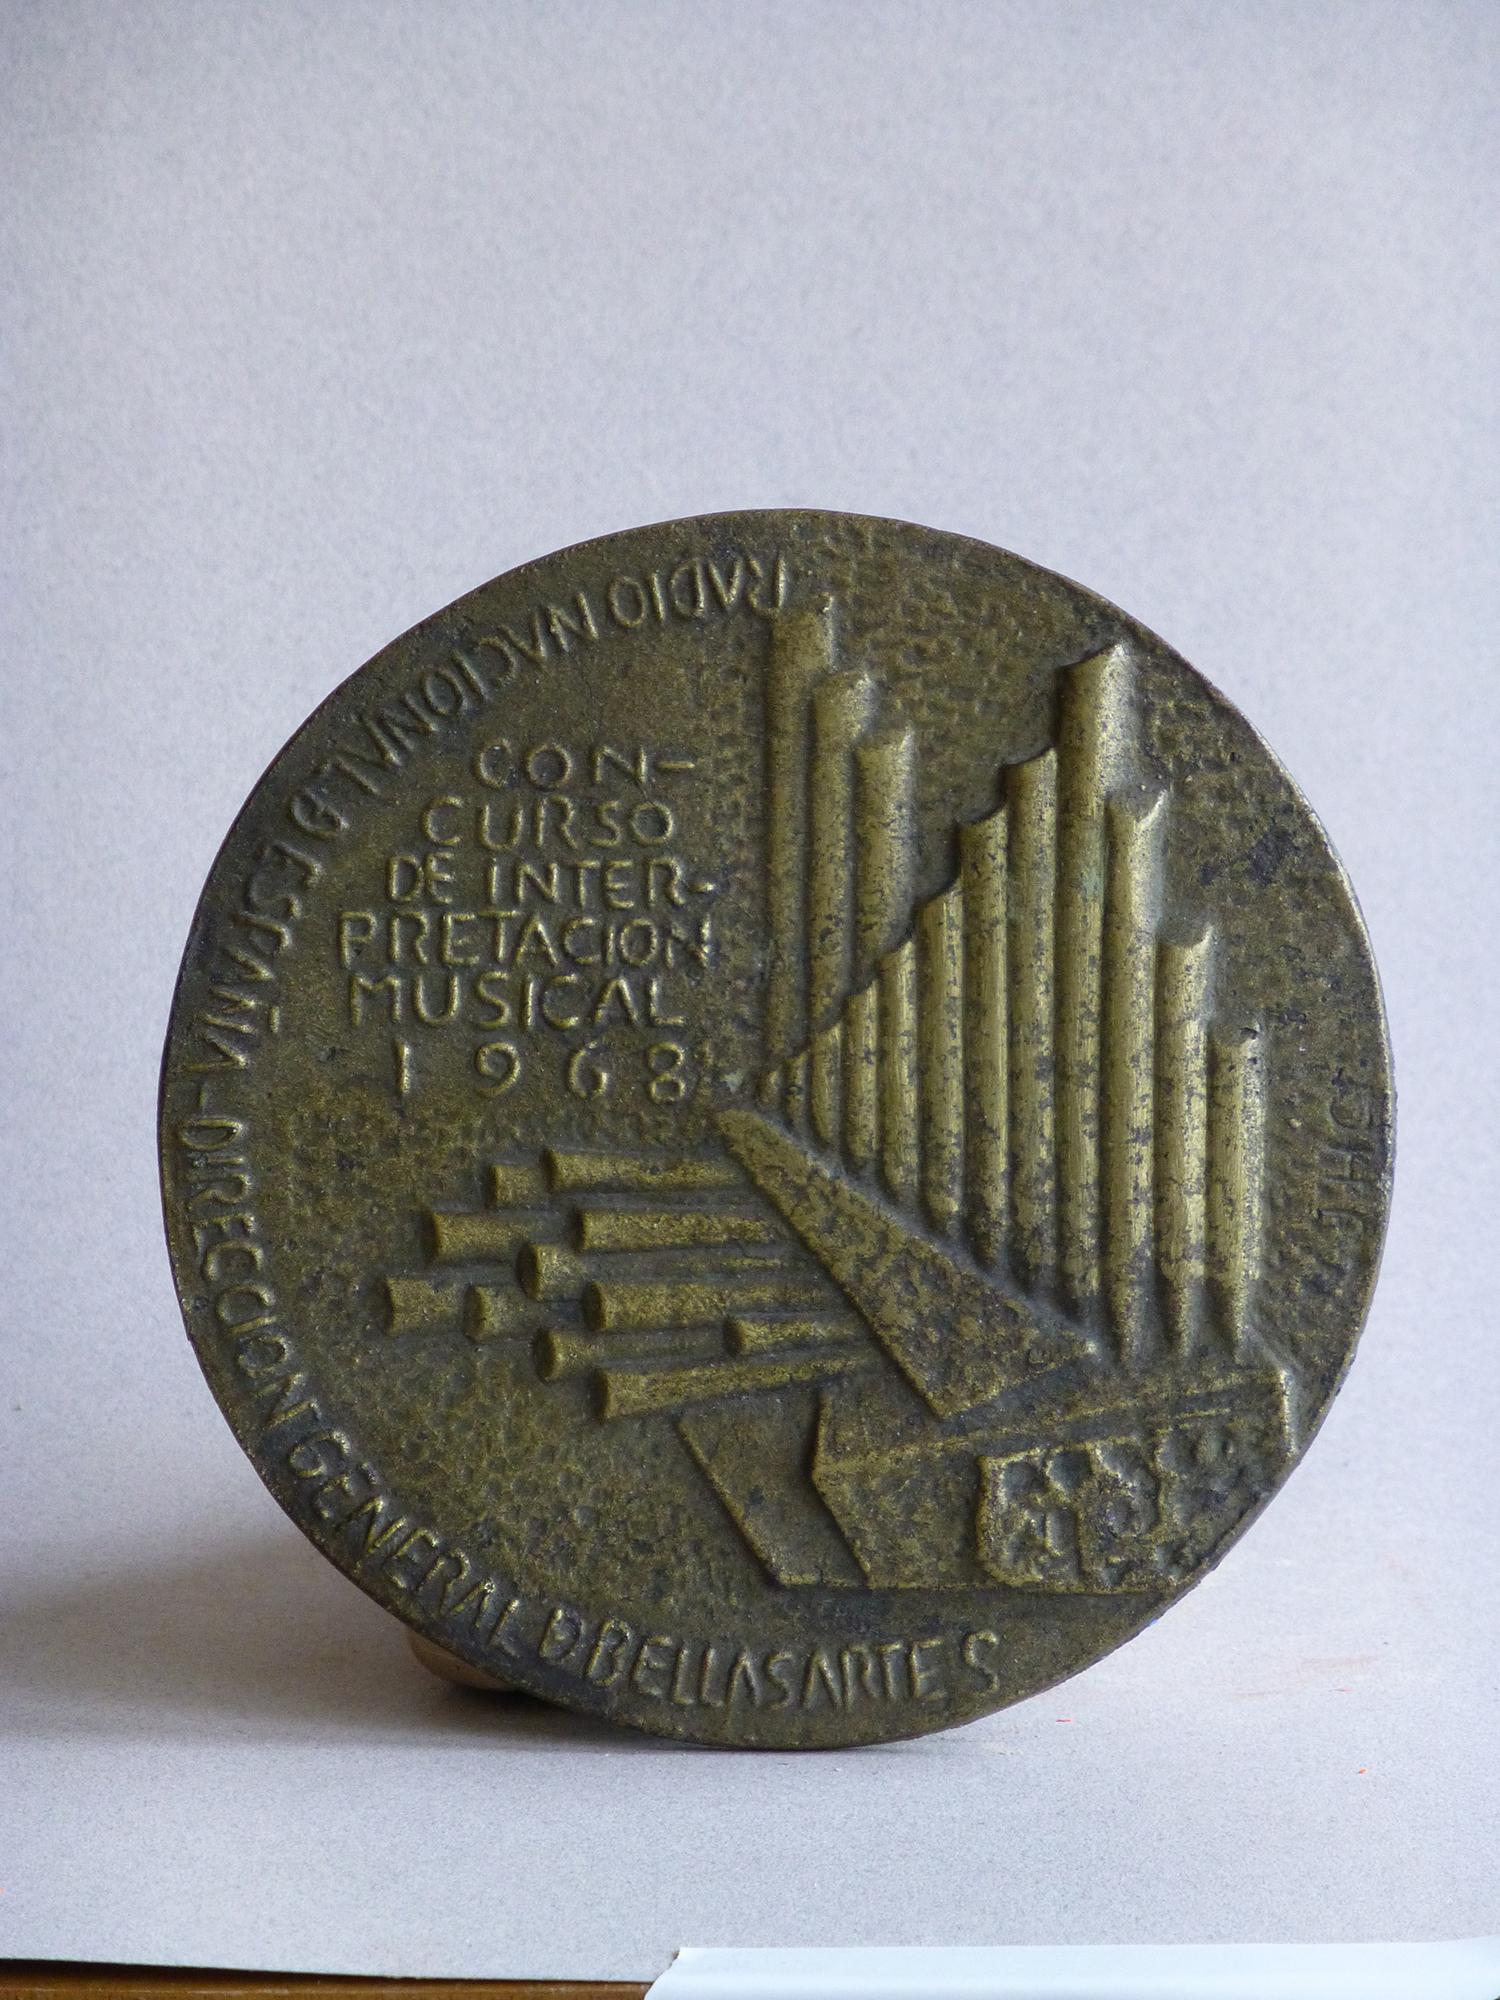 1968.2. A la Música, medalla, bronce, 13x0,4 cms. 1º Concurso Interpretación Musical. R.N.E. 1968